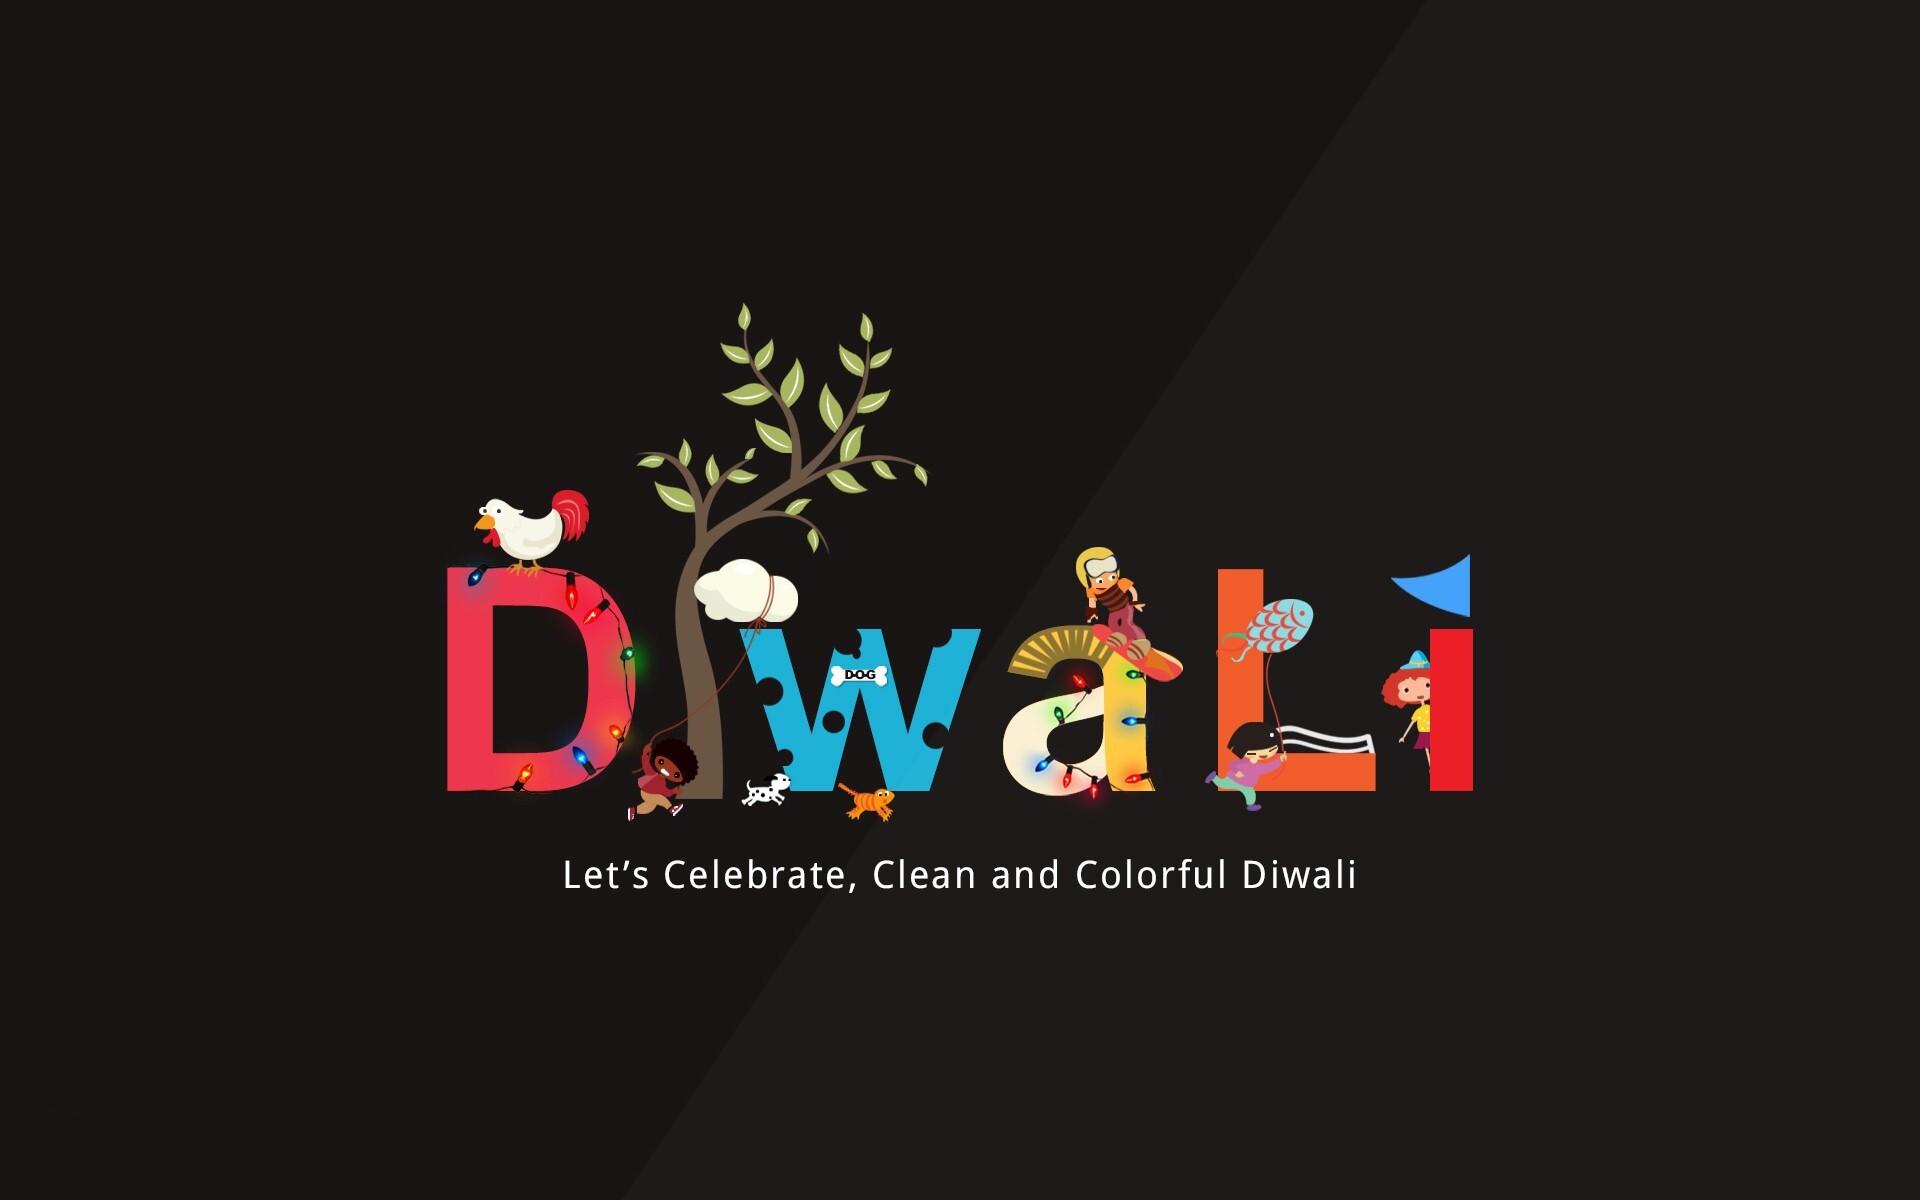 Happy Diwali Desktop Pc Laptop Hd Wallpapers Full Screen: Happy Diwali HD Photo